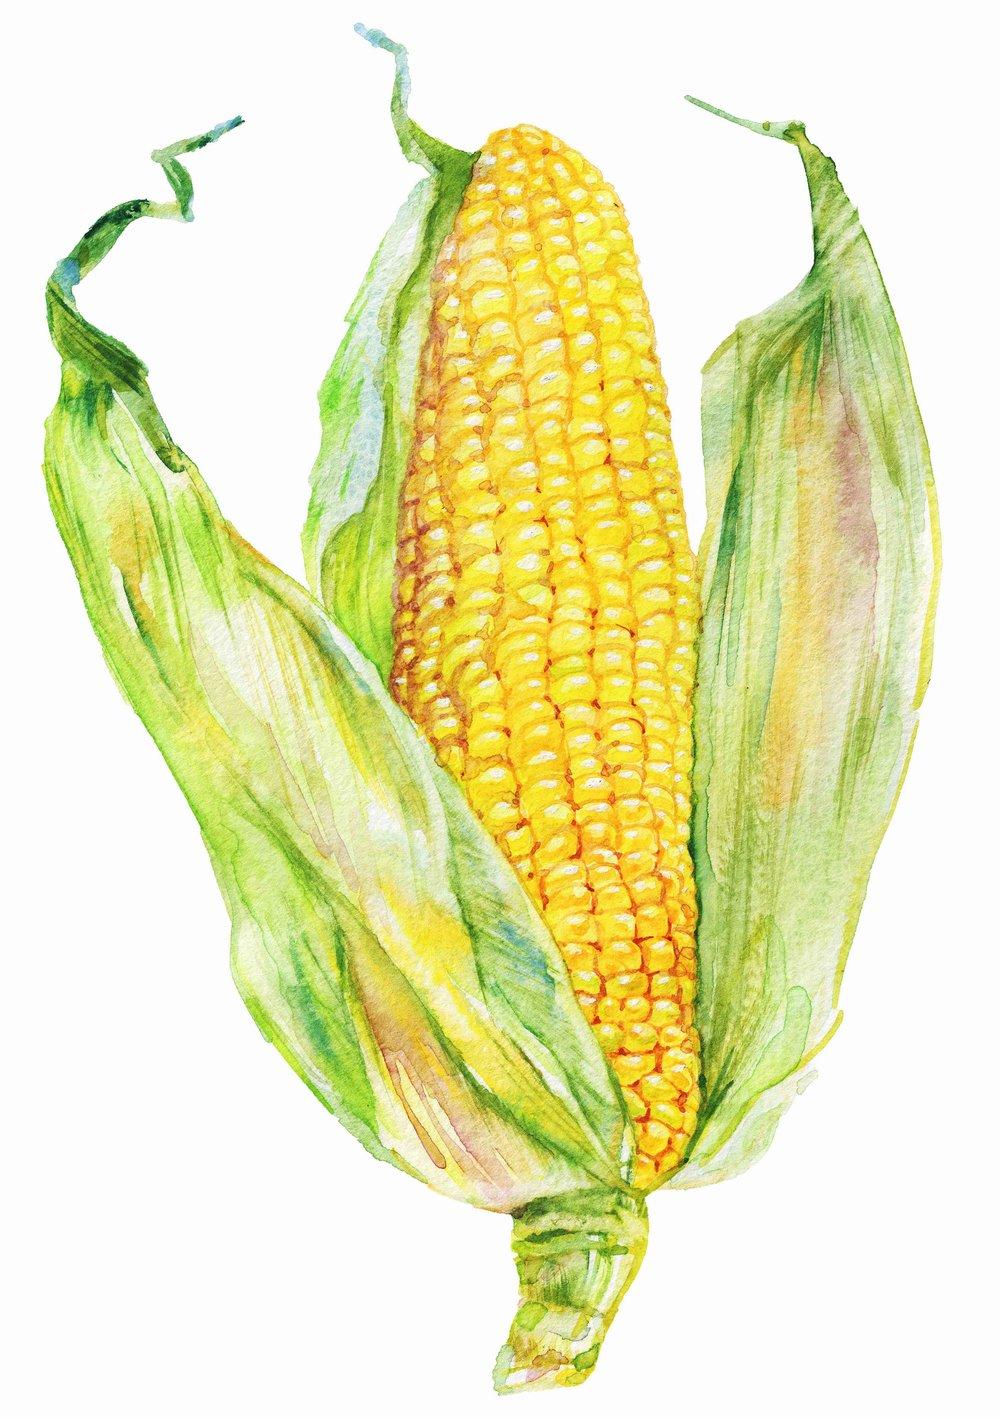 AdobeStock_172007641 corn watercolour copy.jpg